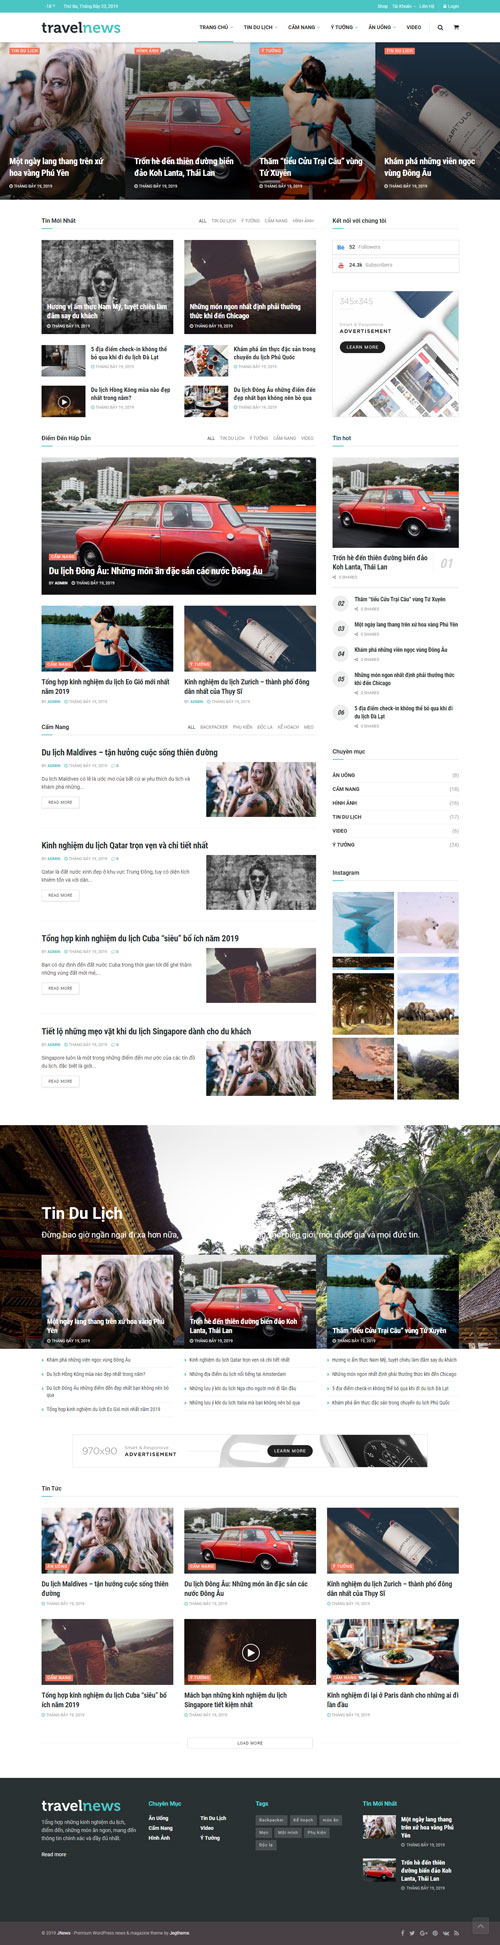 Website tin du lịch 1